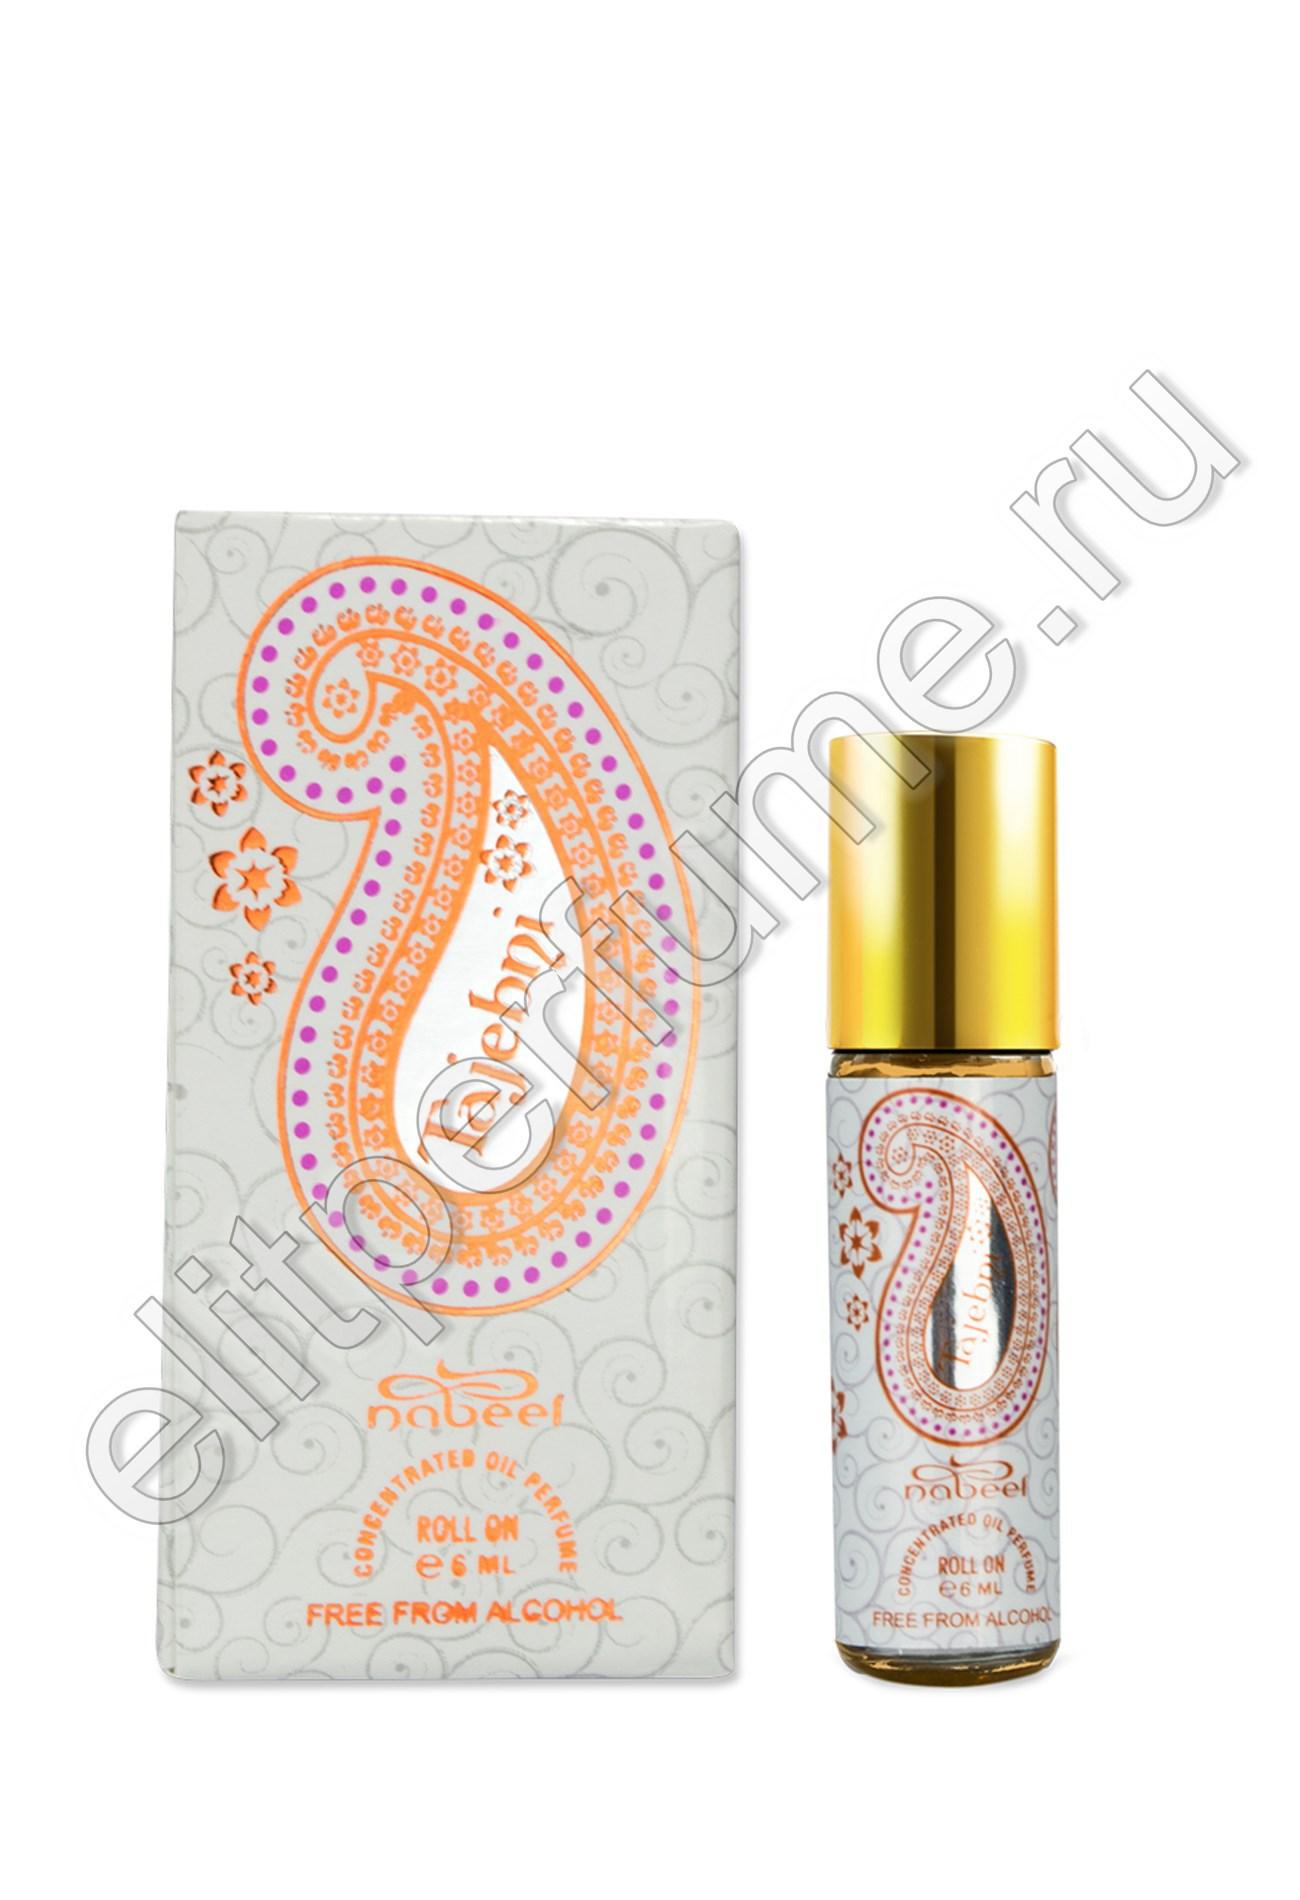 Tajebni Таджибни 6 мл арабские масляные духи от Набиль Nabeel Perfumes